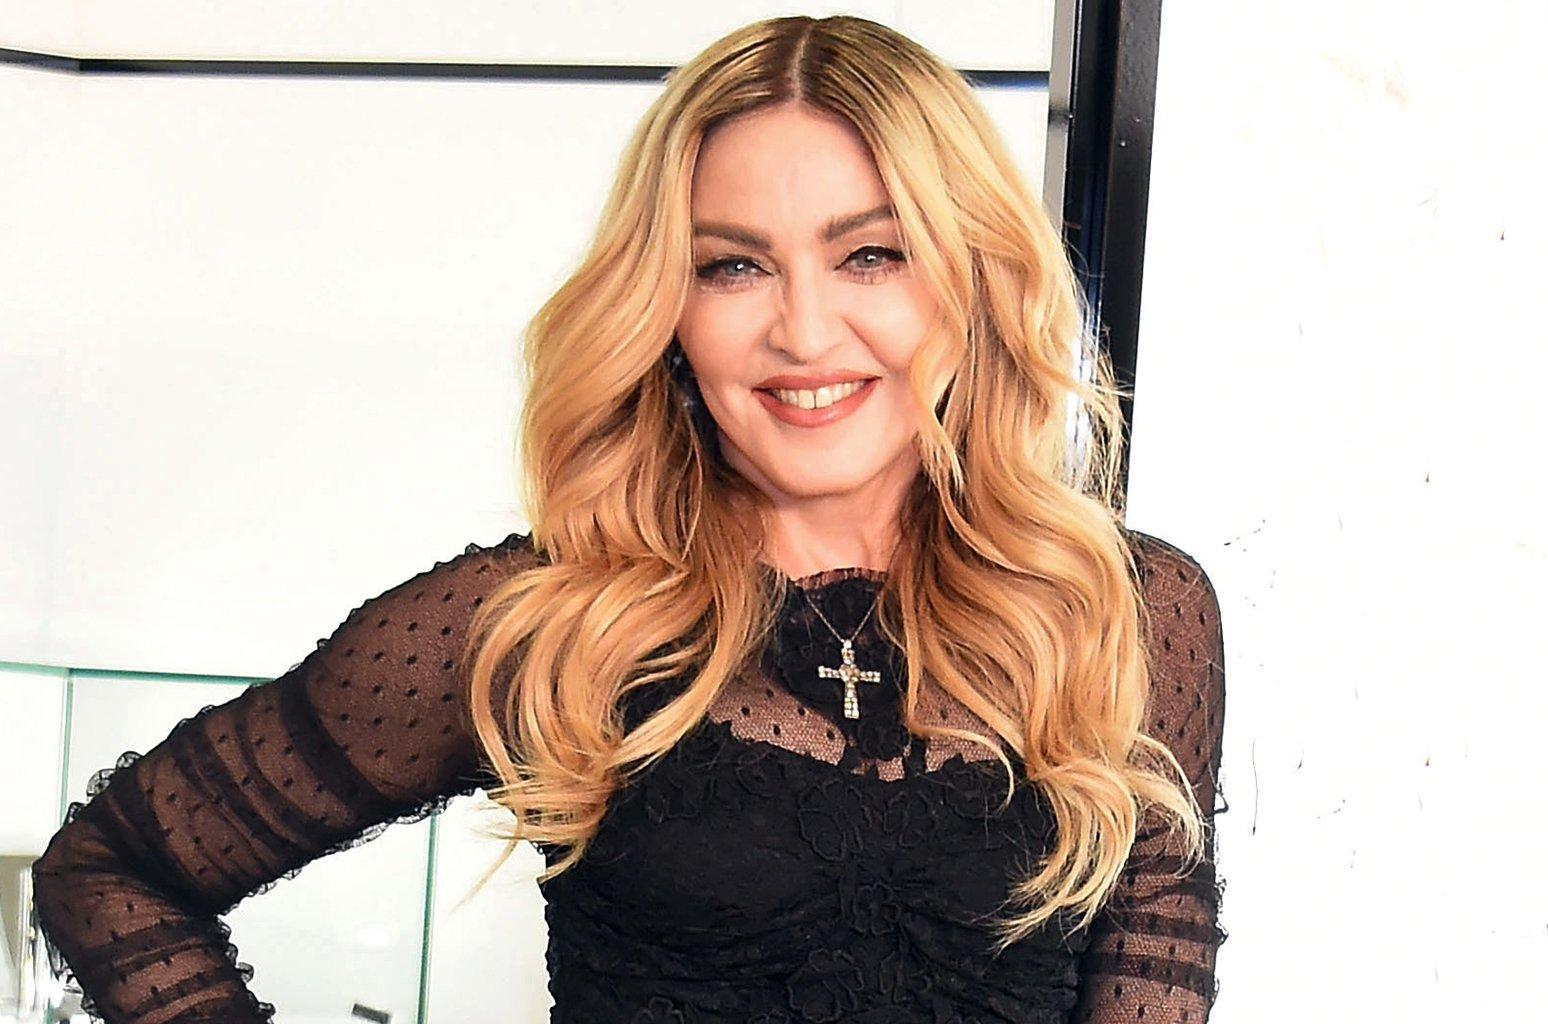 madonna feb 2016 billboard 1548.jpg?resize=412,232 - Madonna compartilha vídeo divertidíssimo de suas filhas cantando funk